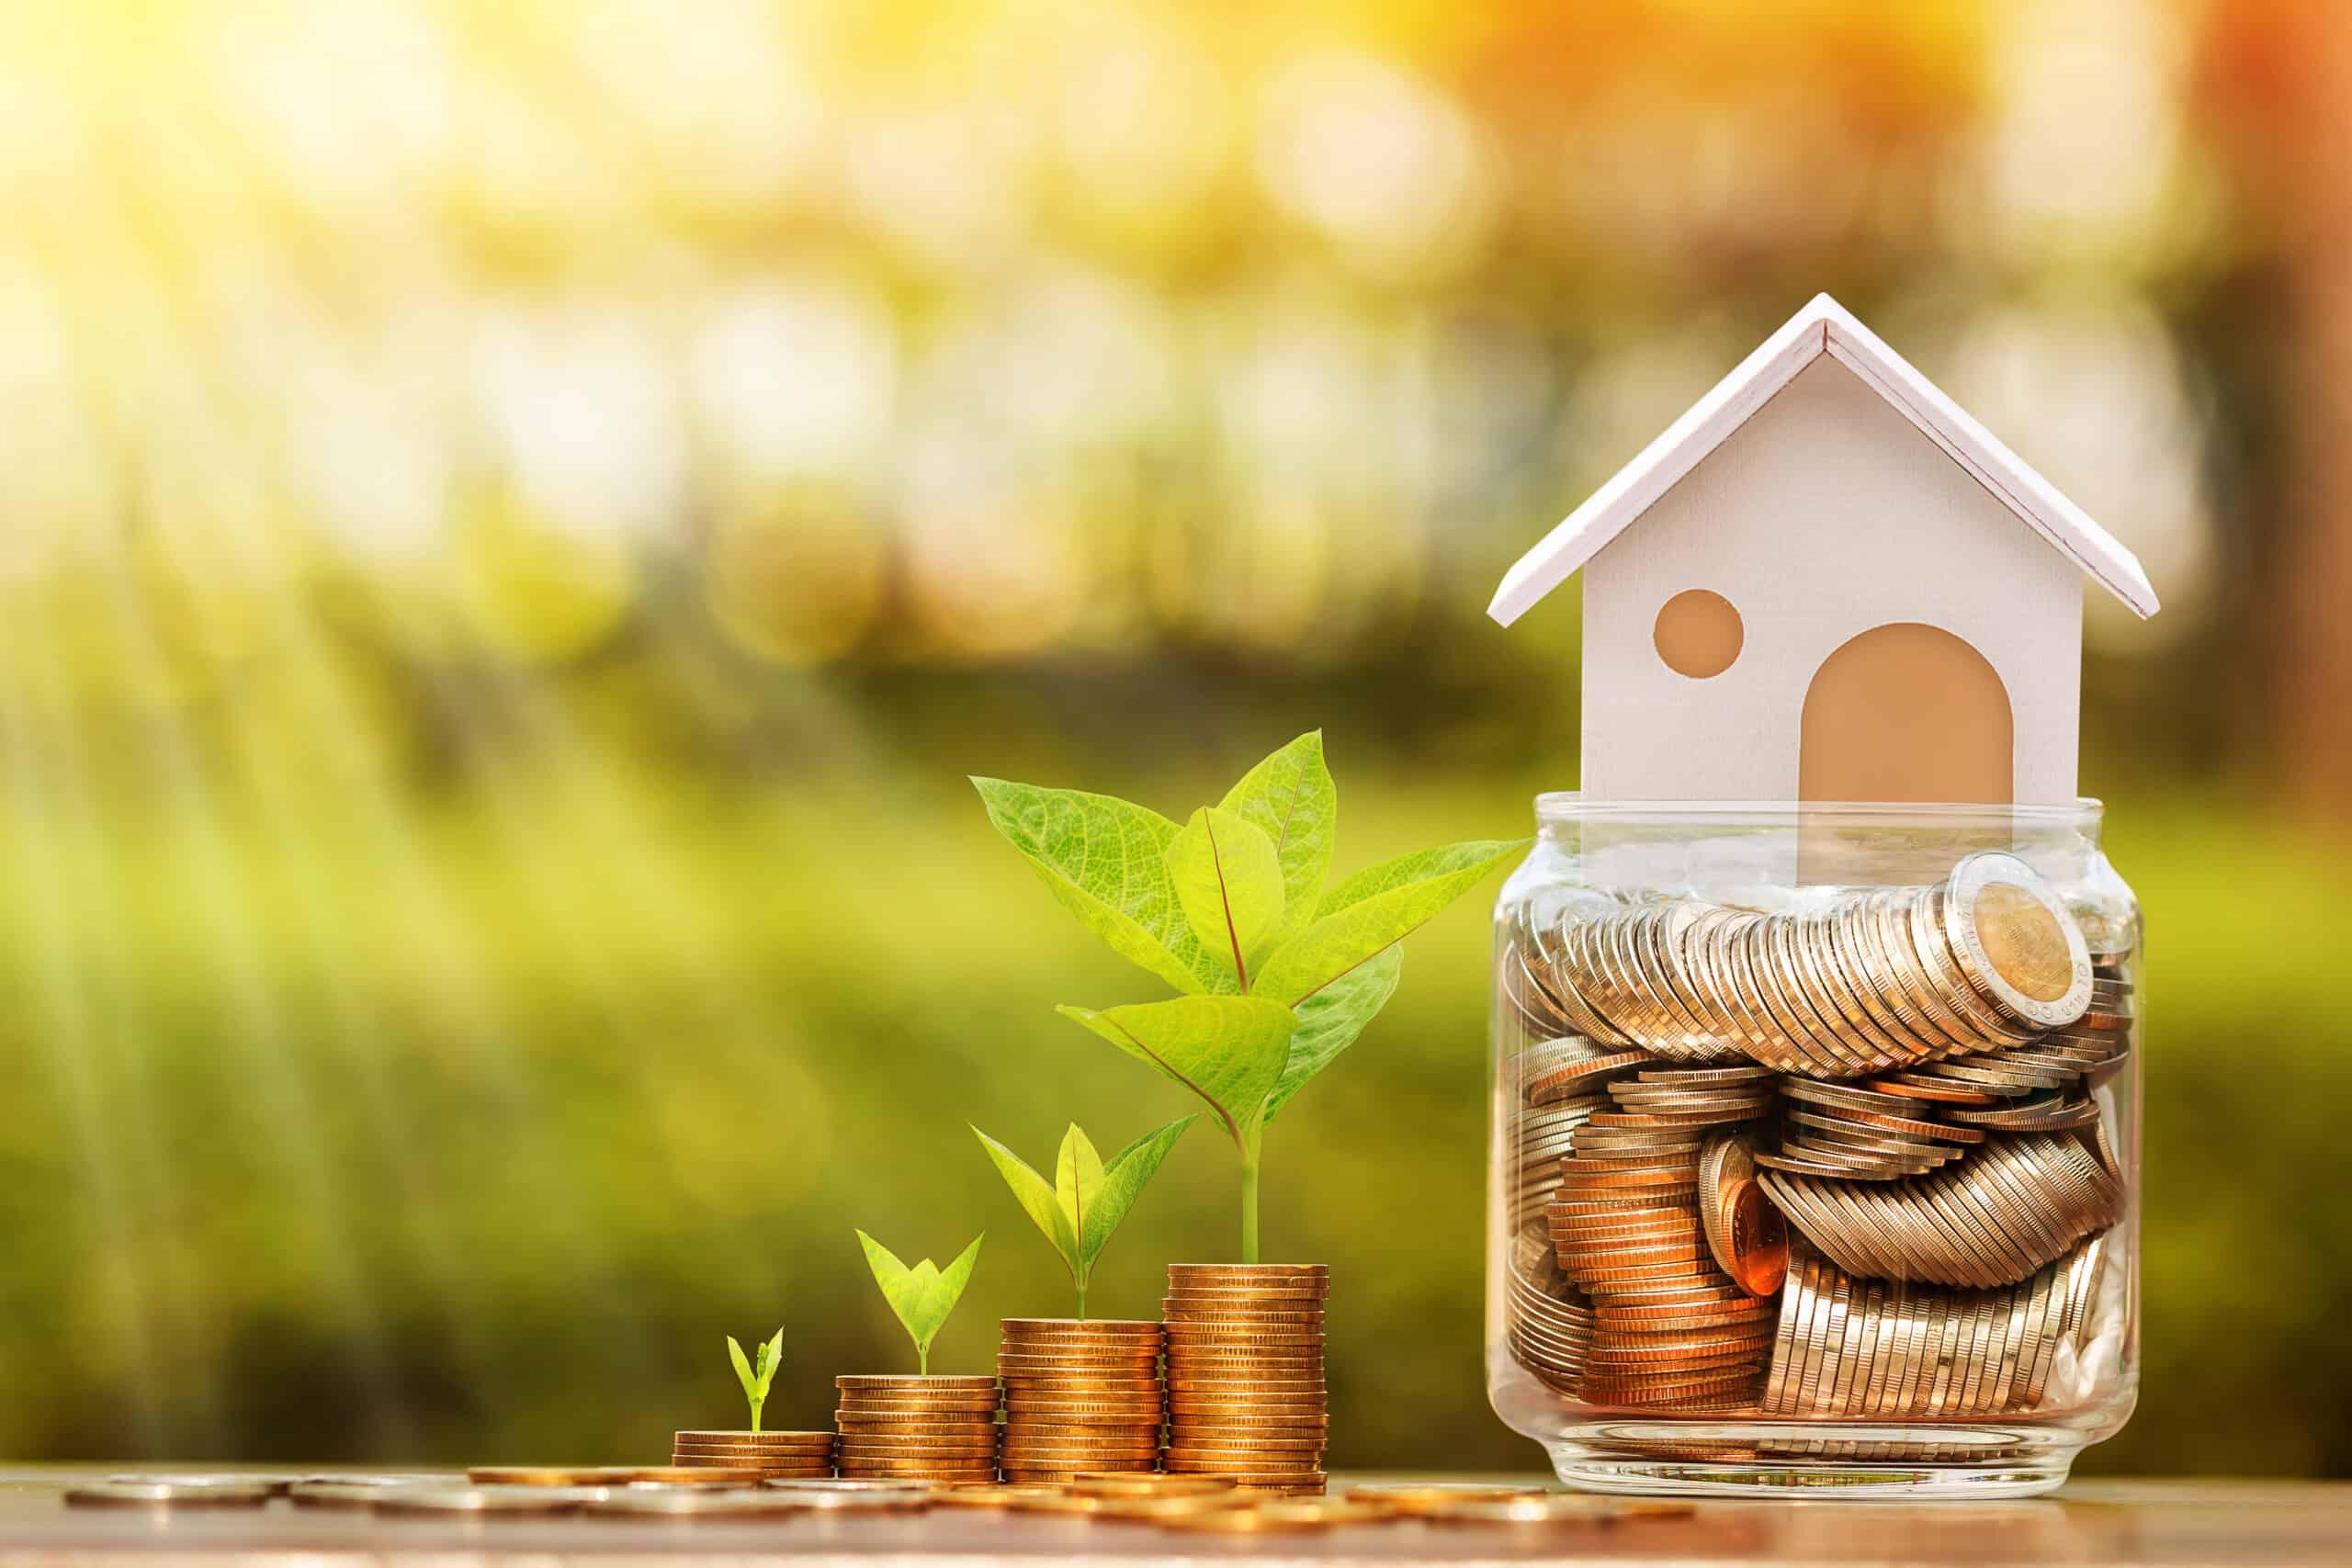 real estate investing